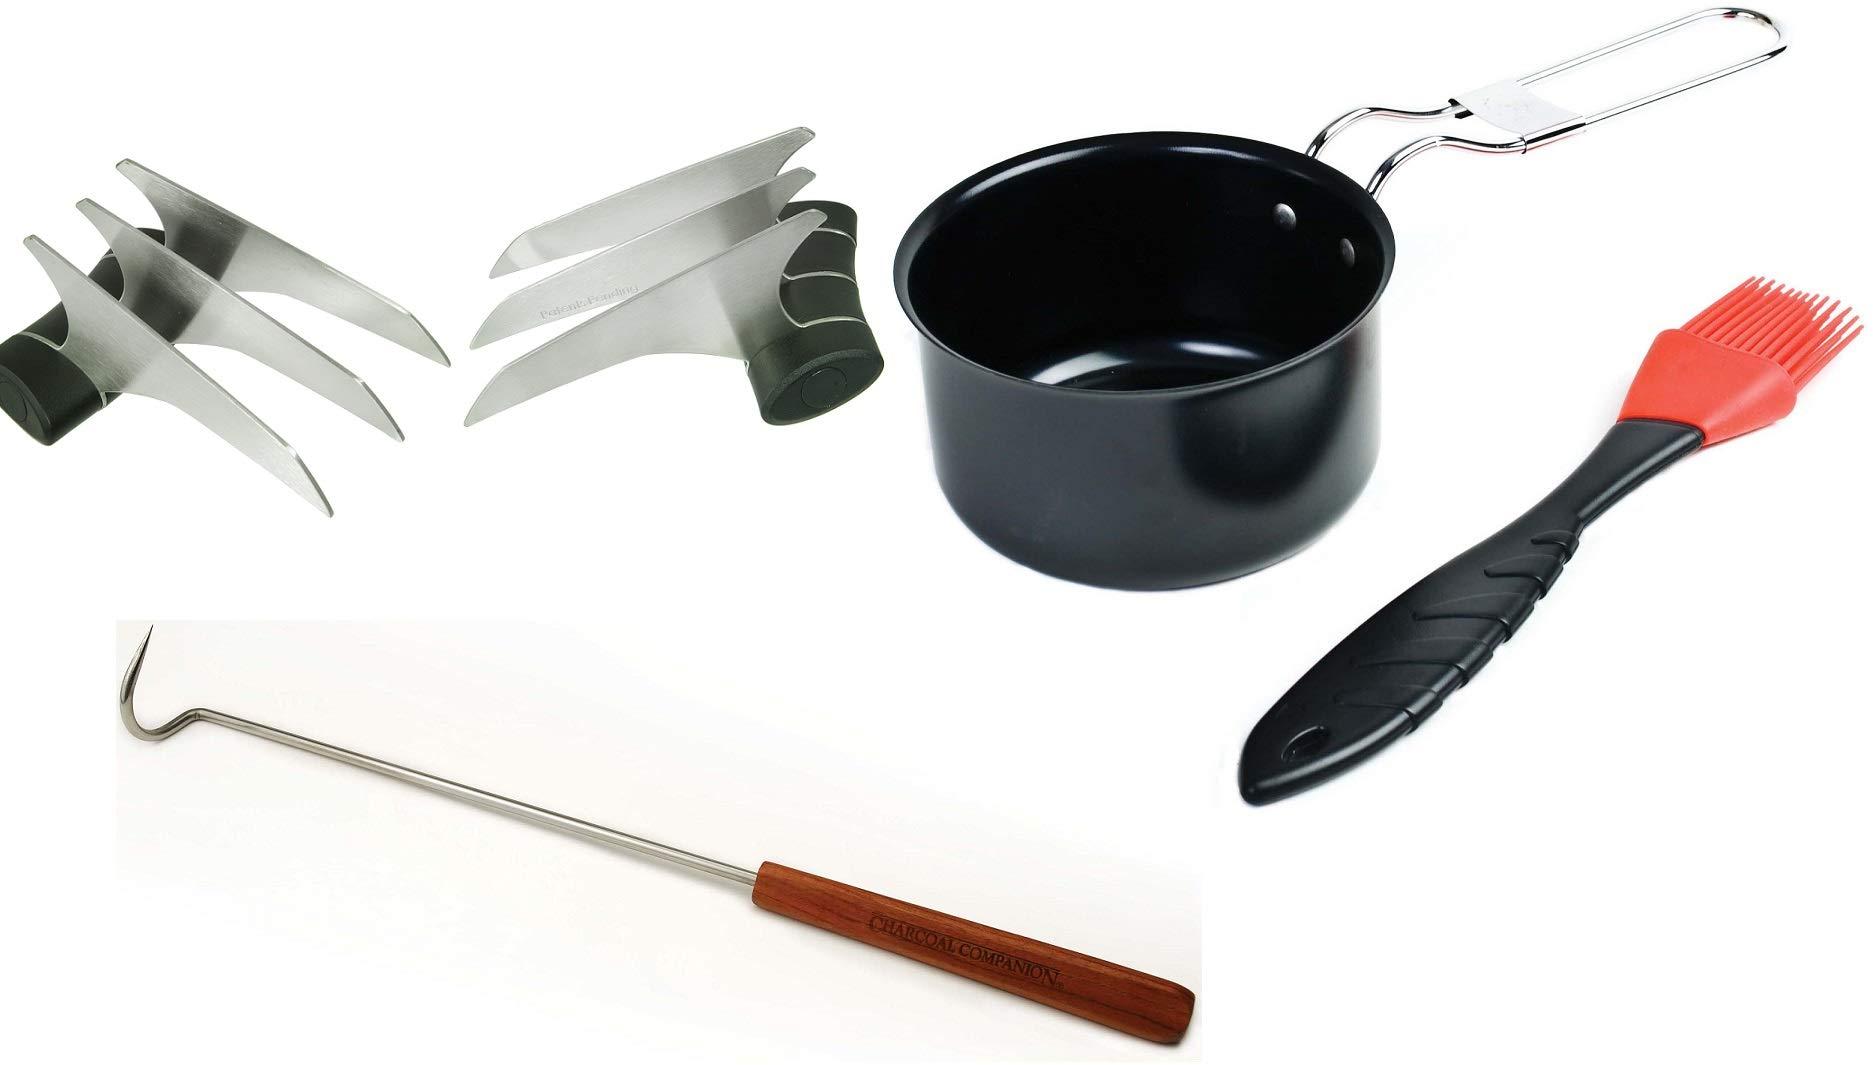 Charcoal Companion CC6691 Brisket Gift Bundle BBQ Accessories by Charcoal Companion